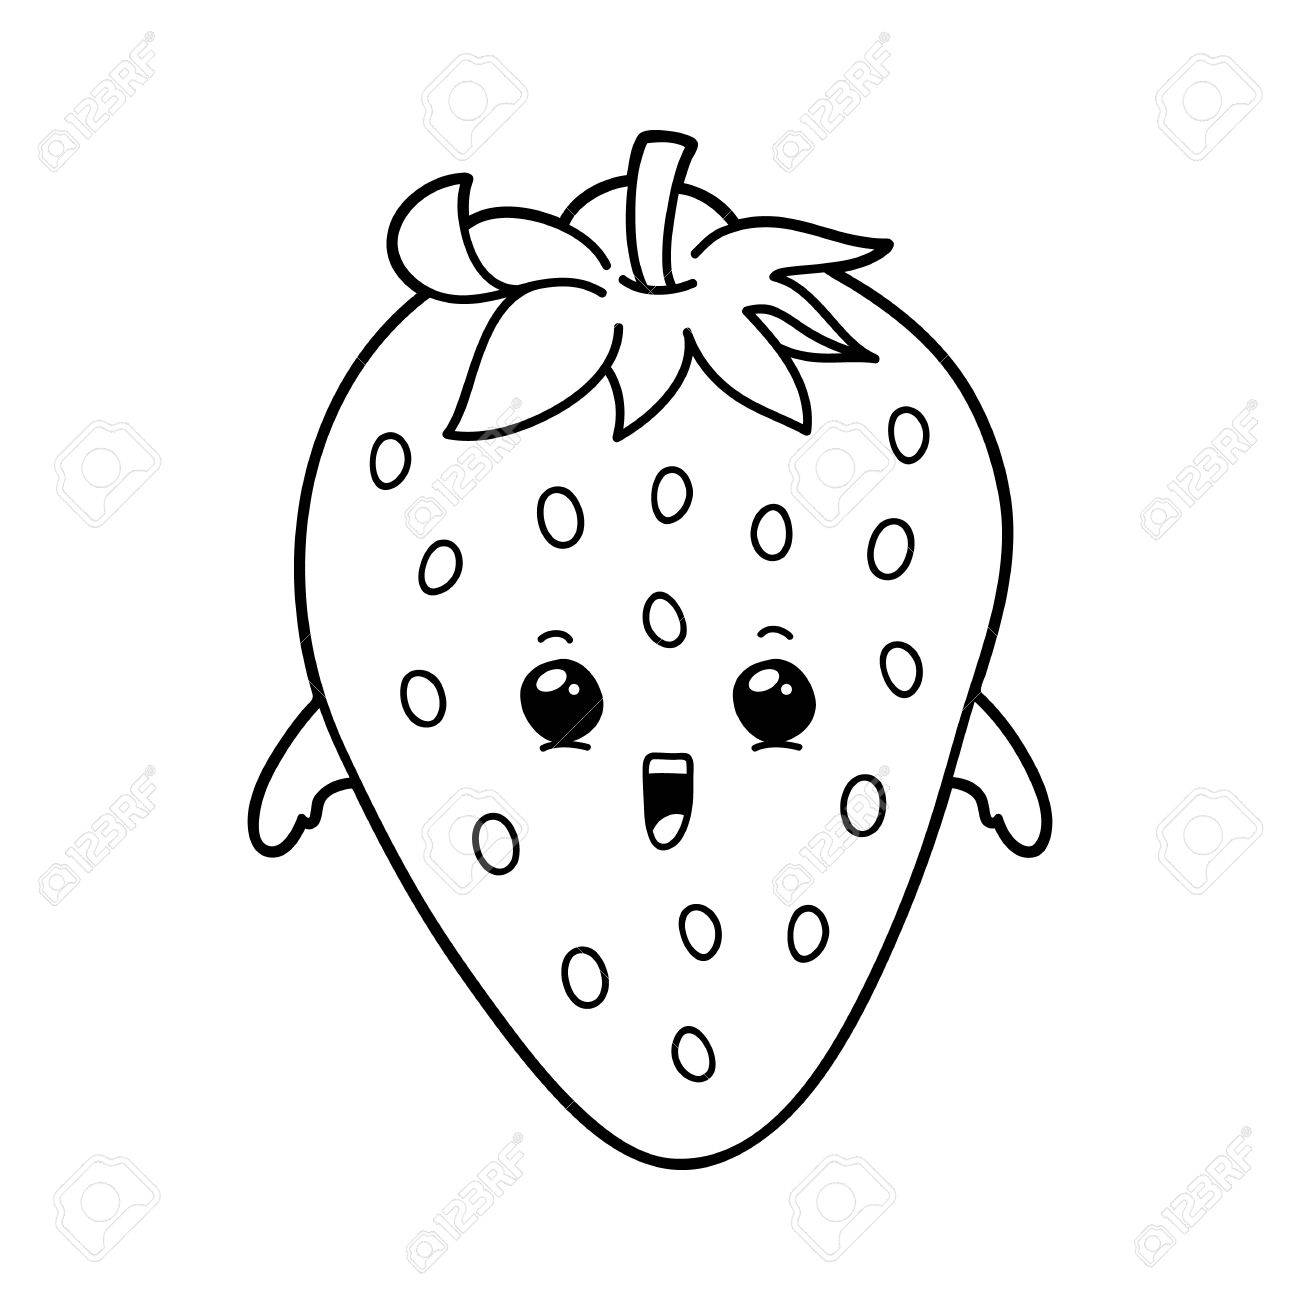 1300x1300 Vector Illustration Of Cute Cartoon Strawberry For Children